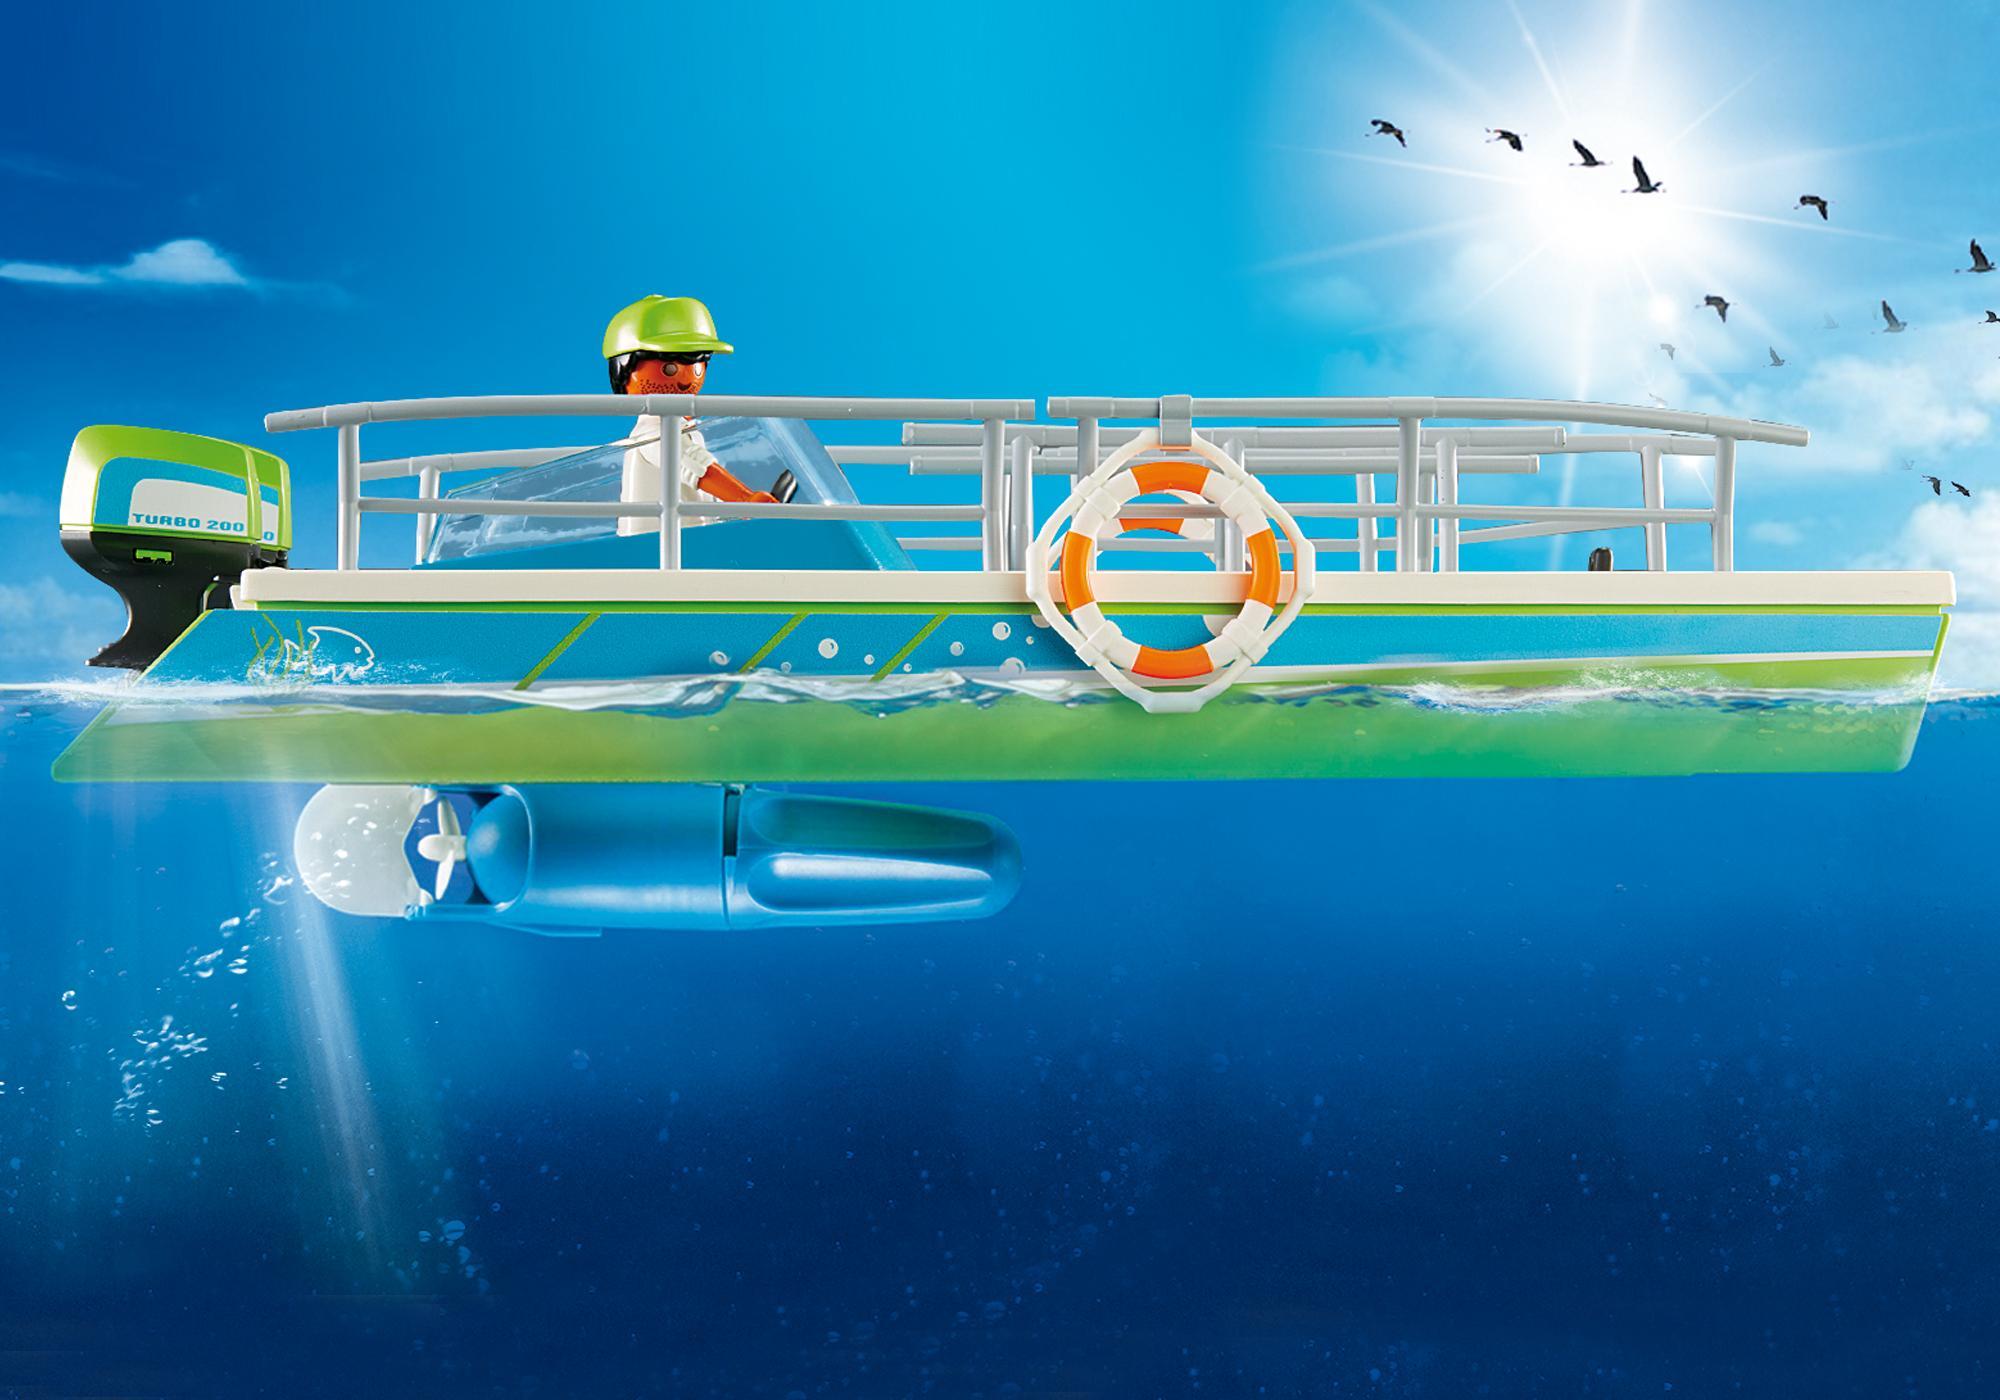 http://media.playmobil.com/i/playmobil/9233_product_extra3/Glasbodenboot mit Unterwassermotor